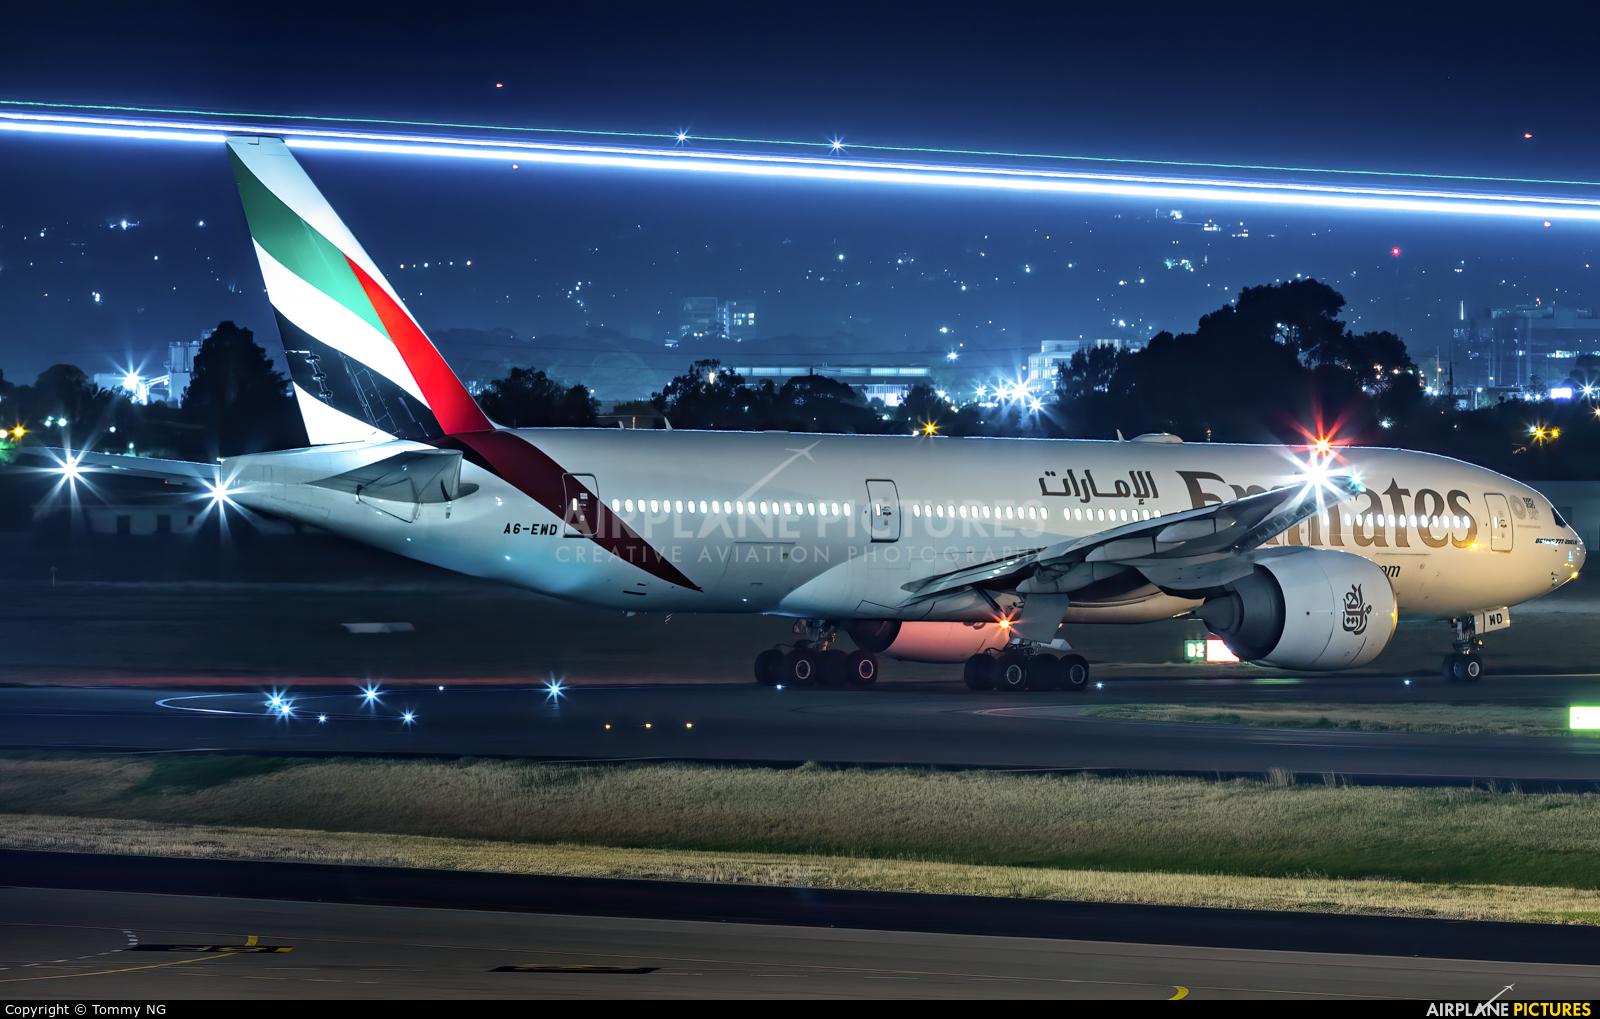 Emirates Airlines A6-EWD aircraft at Adelaide Intl, SA